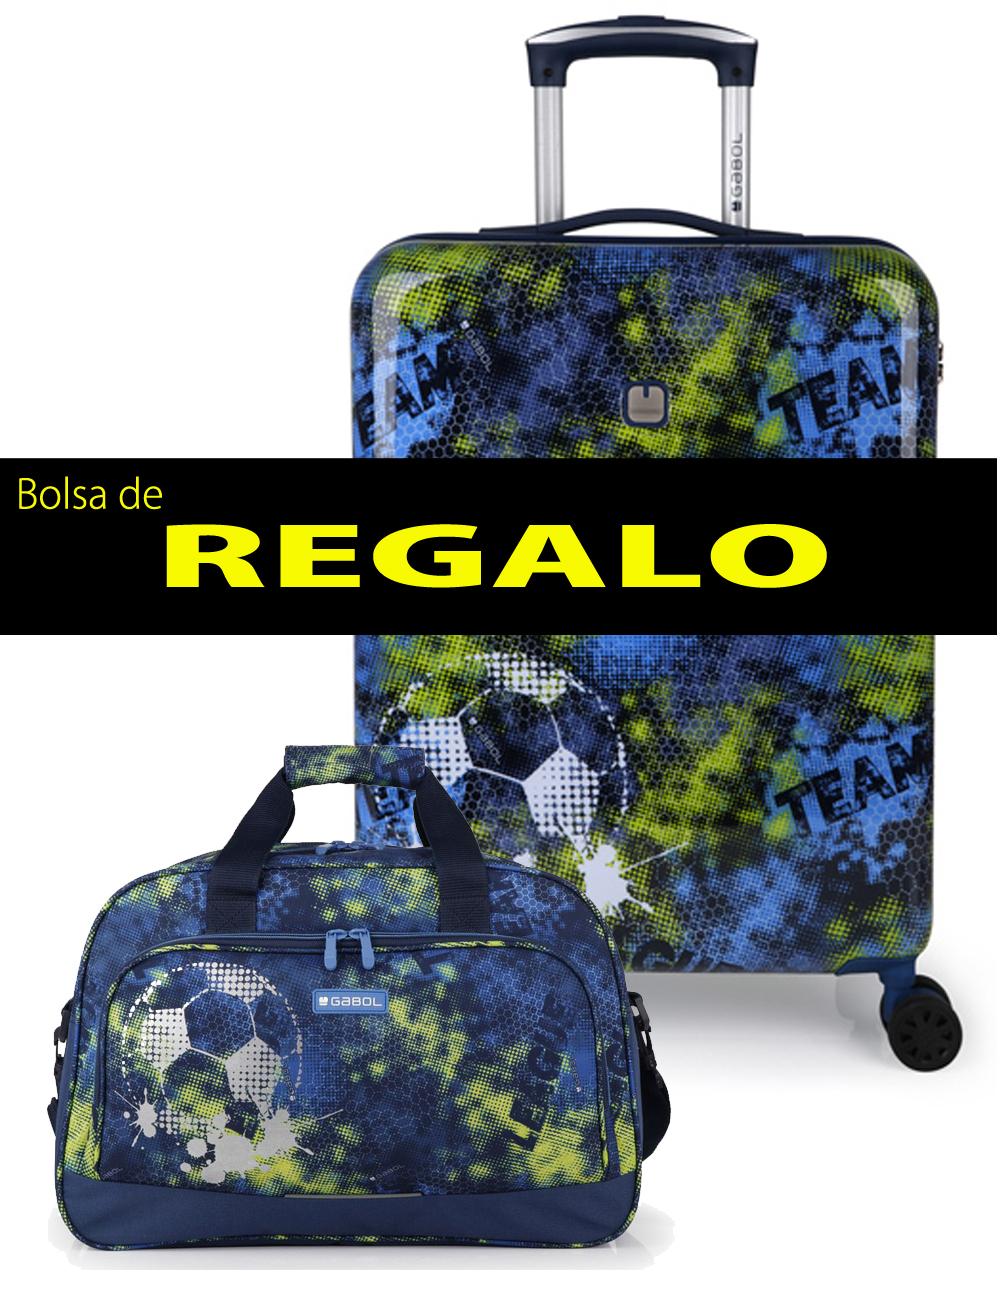 227222 B Maleta de Cabina más Bolsa de Viaje de Regalo Gabol Coach